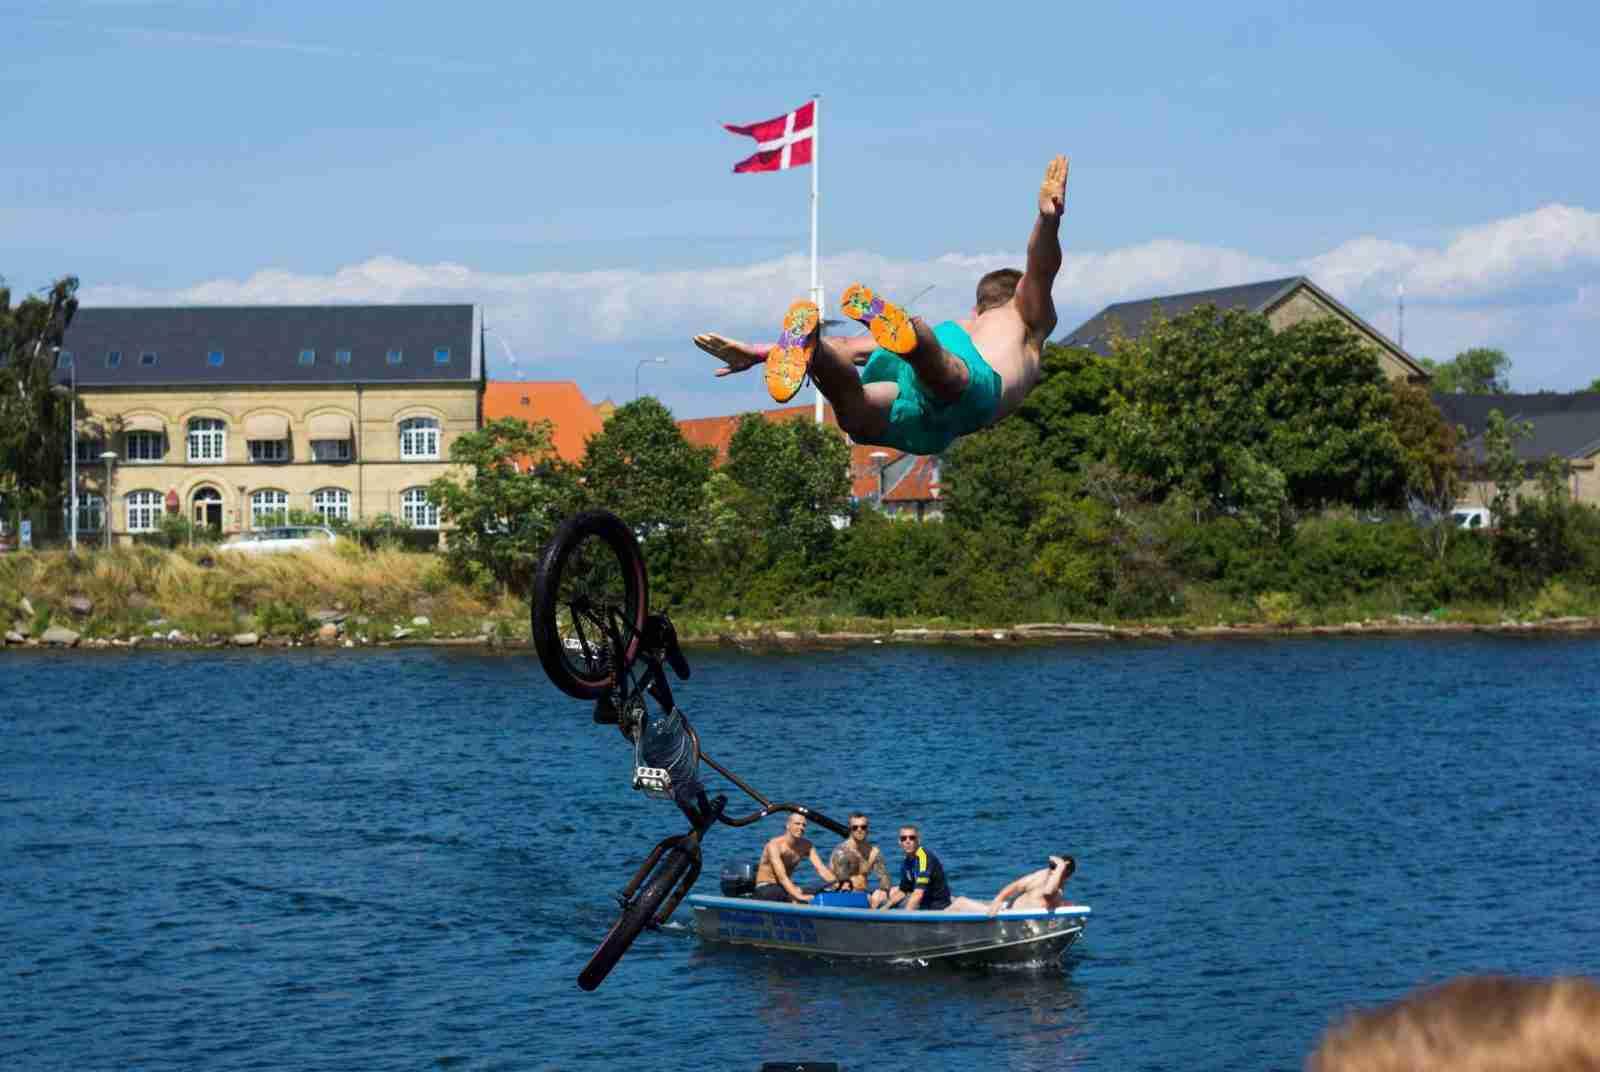 kulturhavn-holmen-dirt-dirtjump-bmx-vand-havn-sjov-friluftsliv-copenhagen-kbh-christianshavn-pumptrack-cykelleg